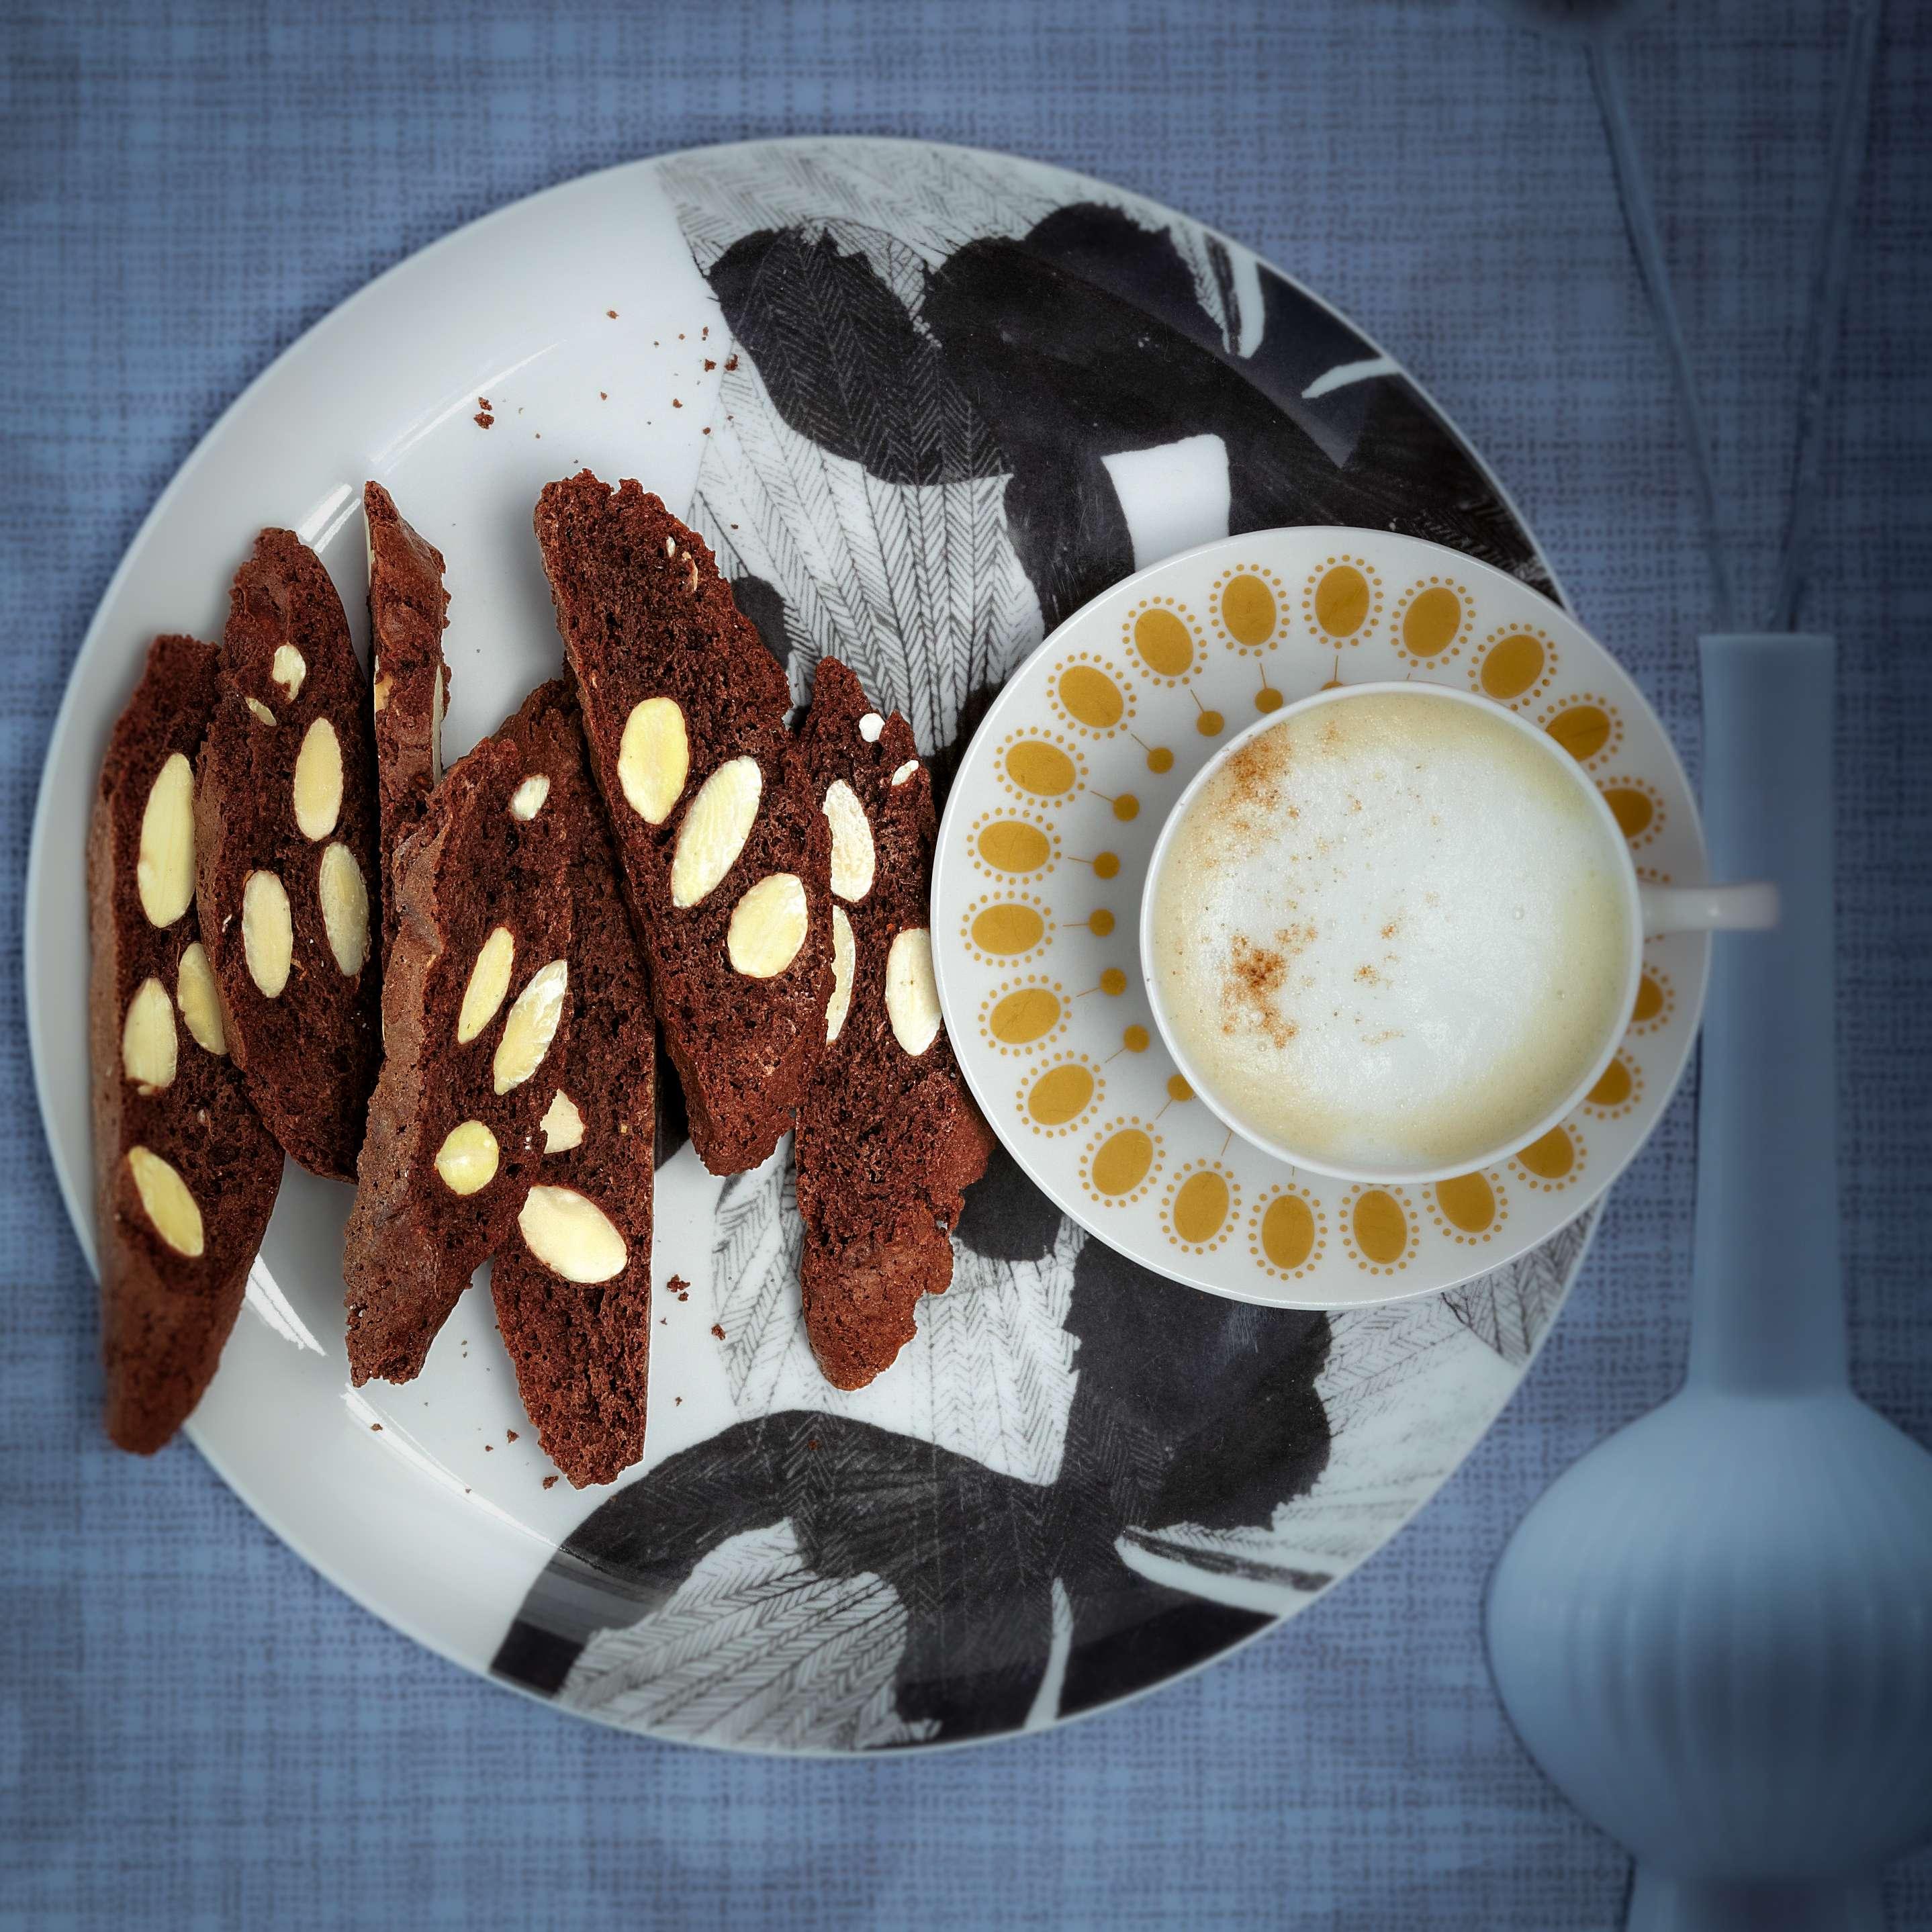 Schokoladen-Mandel-Cantuccini